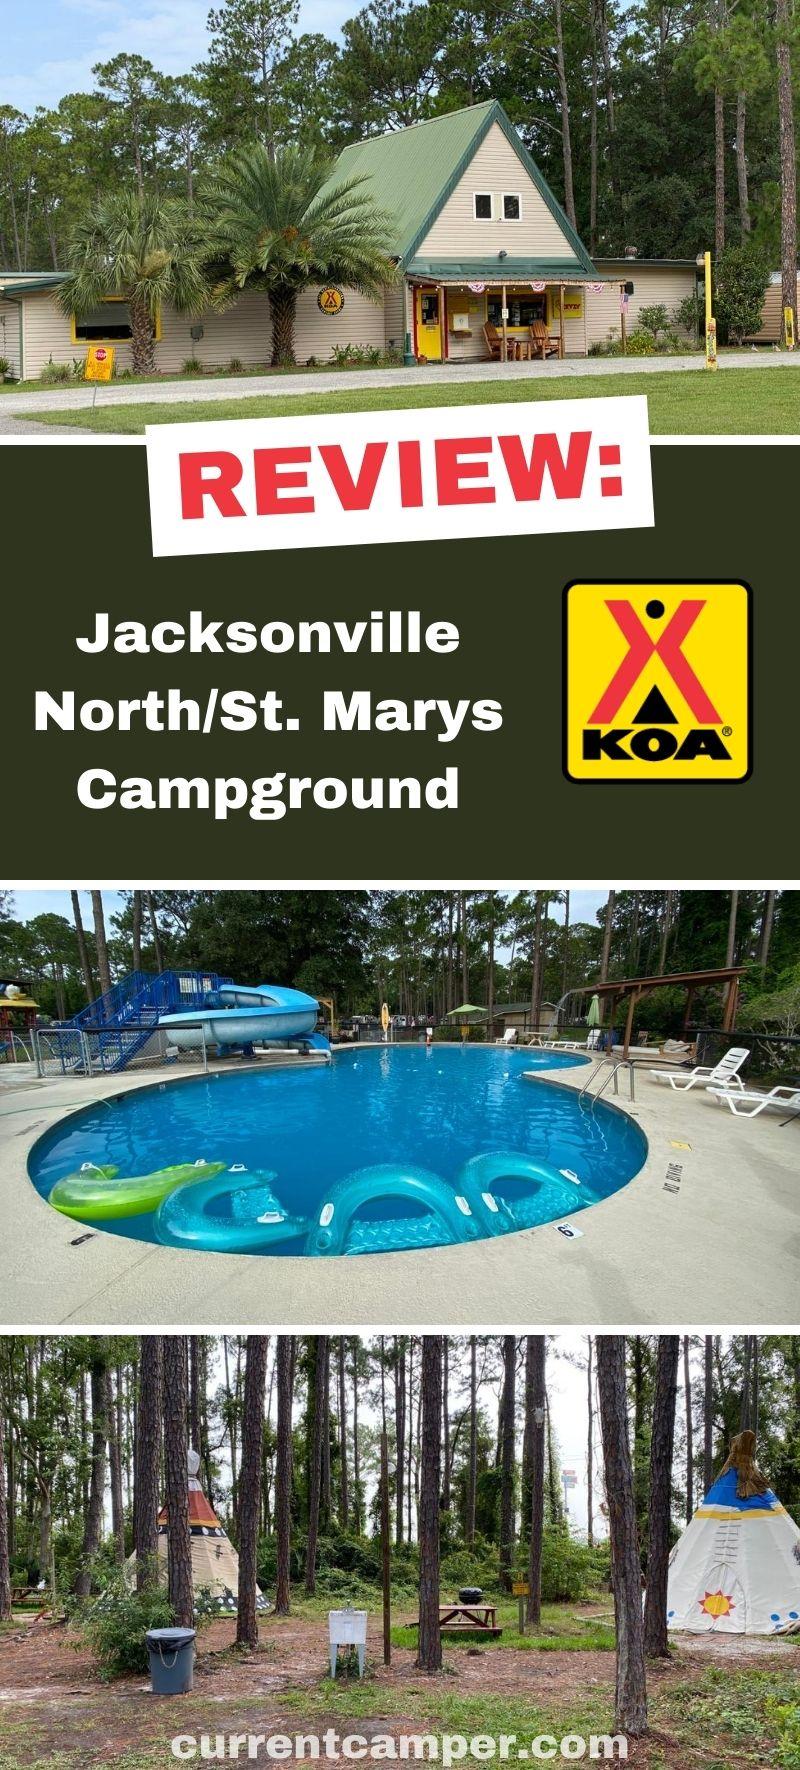 Jacksonville camping #camping #florida camper tips #koa campground #travel #rv #rving rv tips #koa